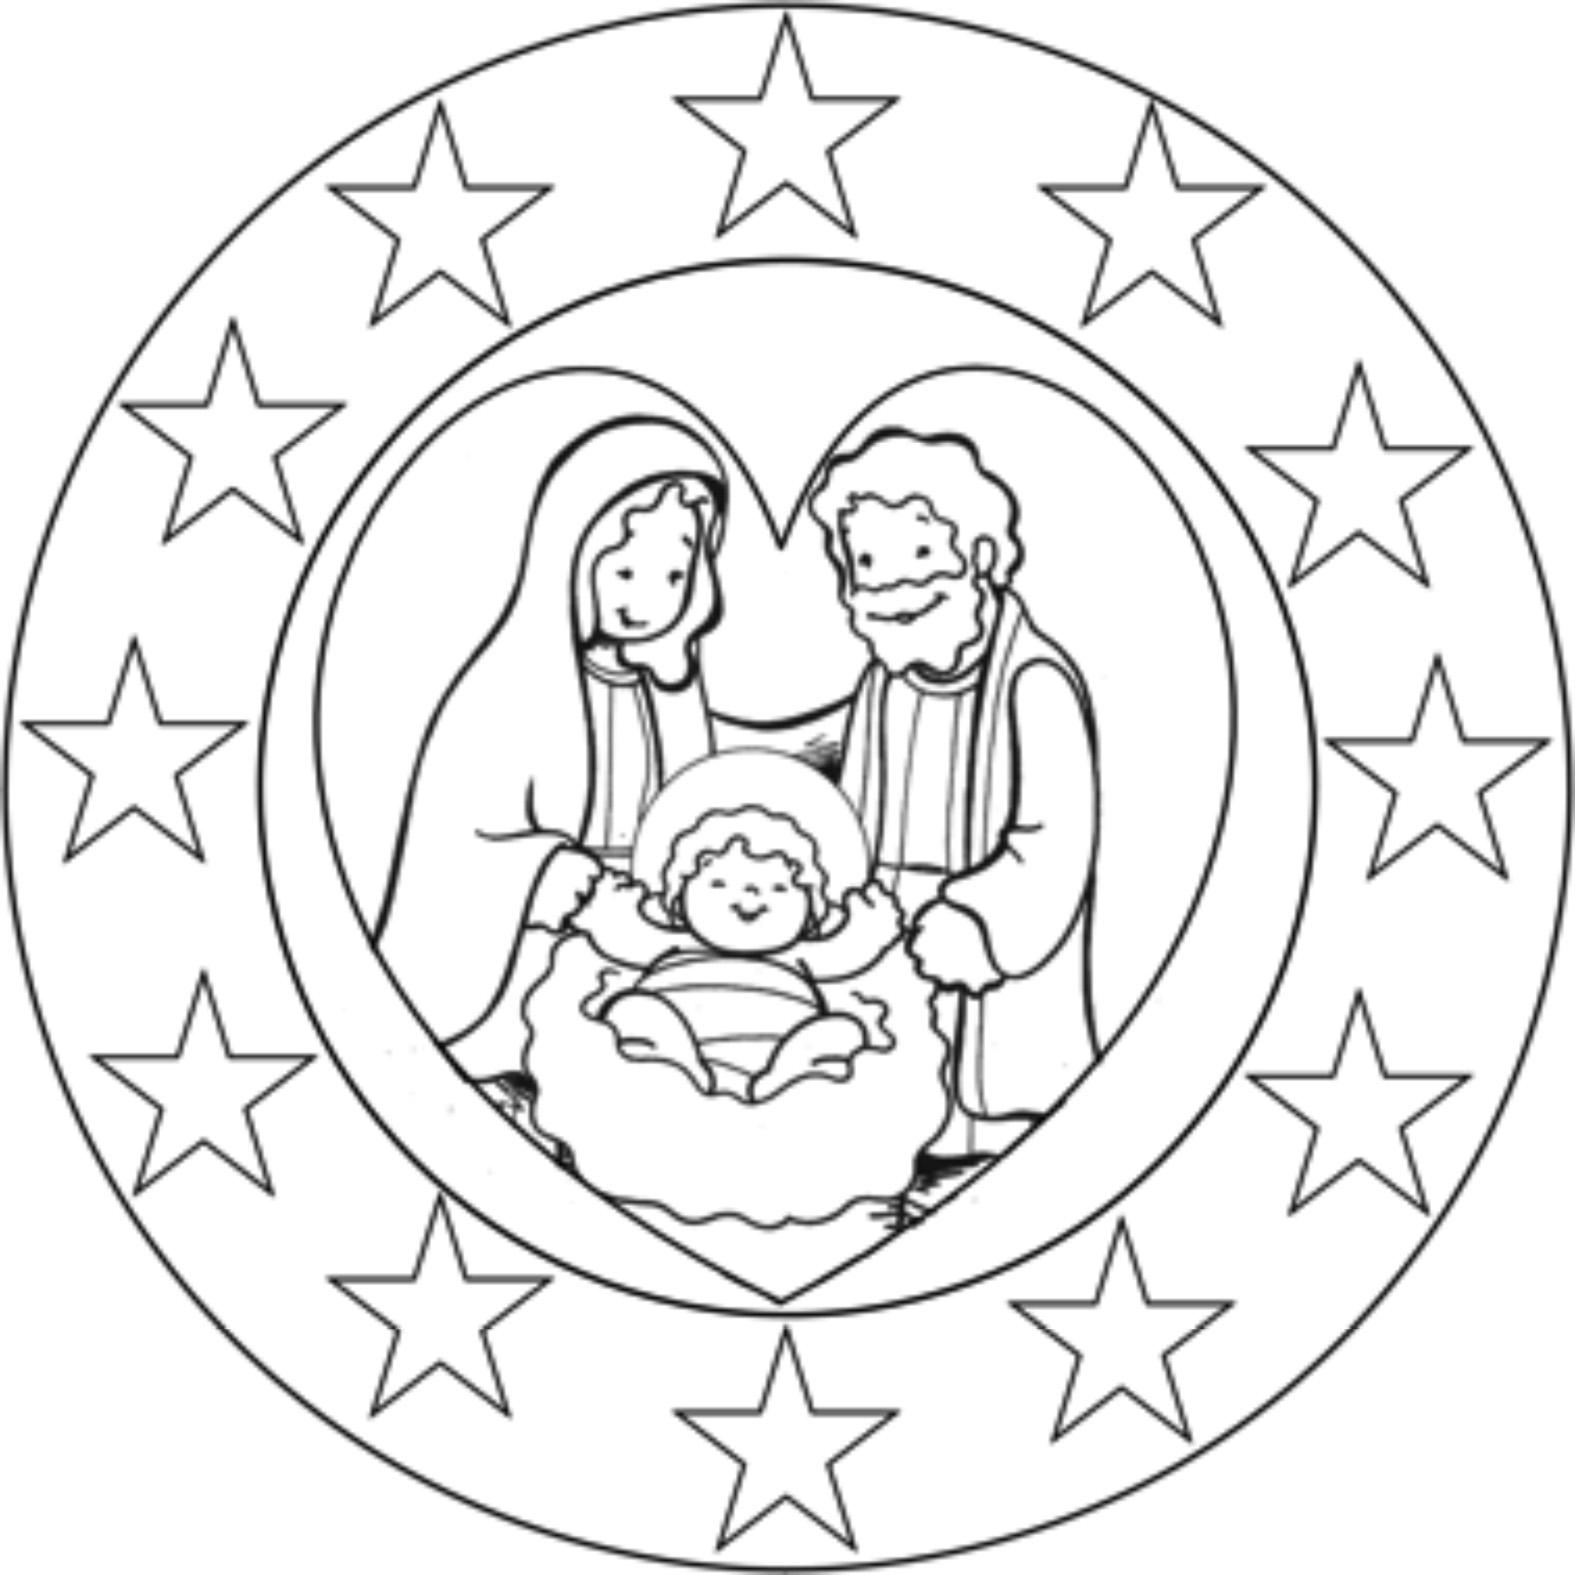 Dibujos Para Colorear De La Familia Telerin Familias